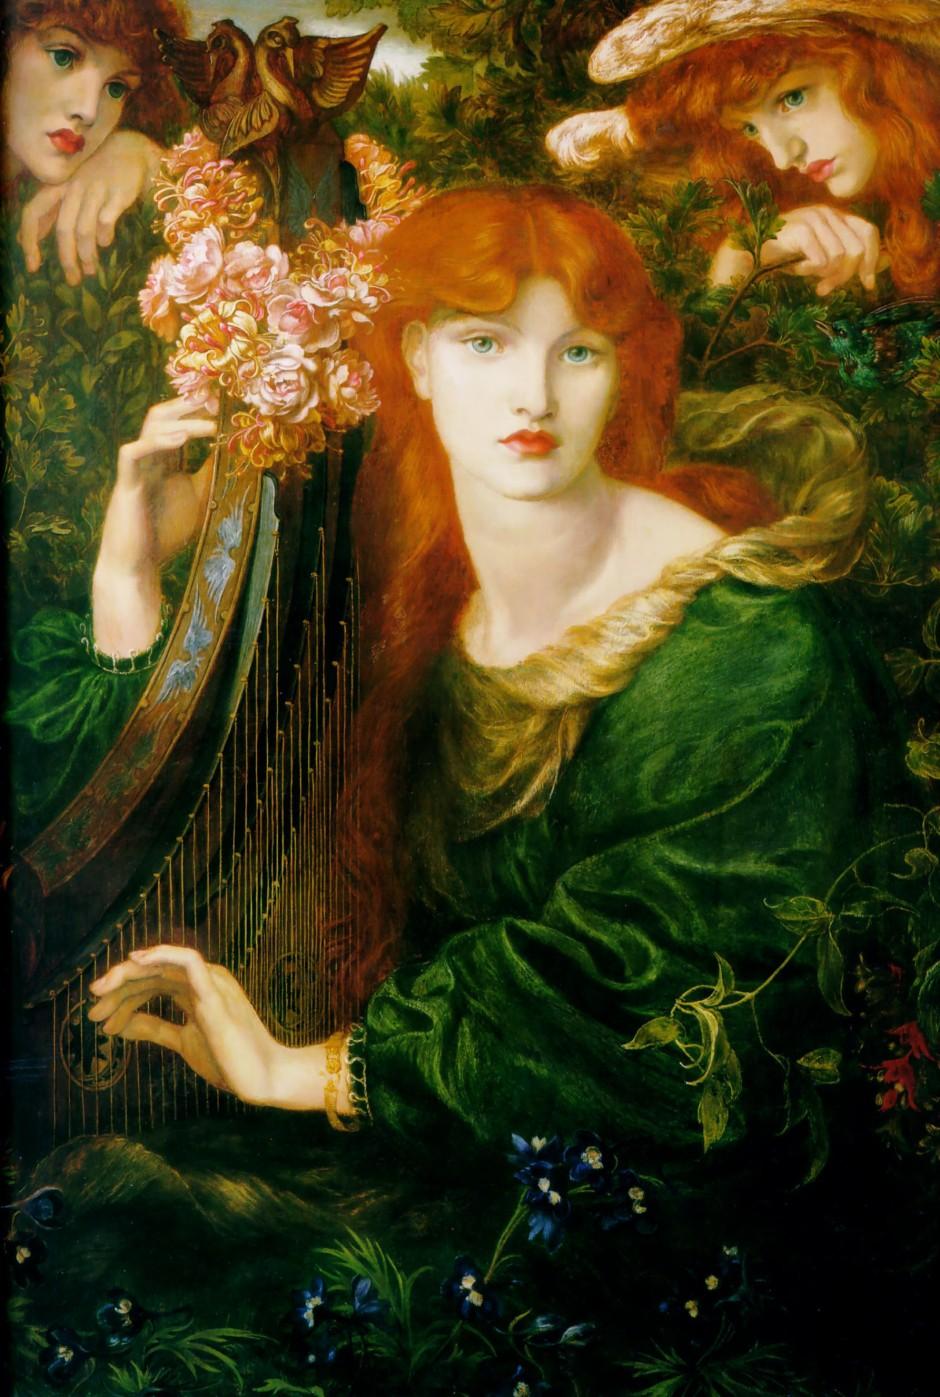 Rossetti,_Dante_Gabriel_-_La_Ghirlandata_-_1871-1874